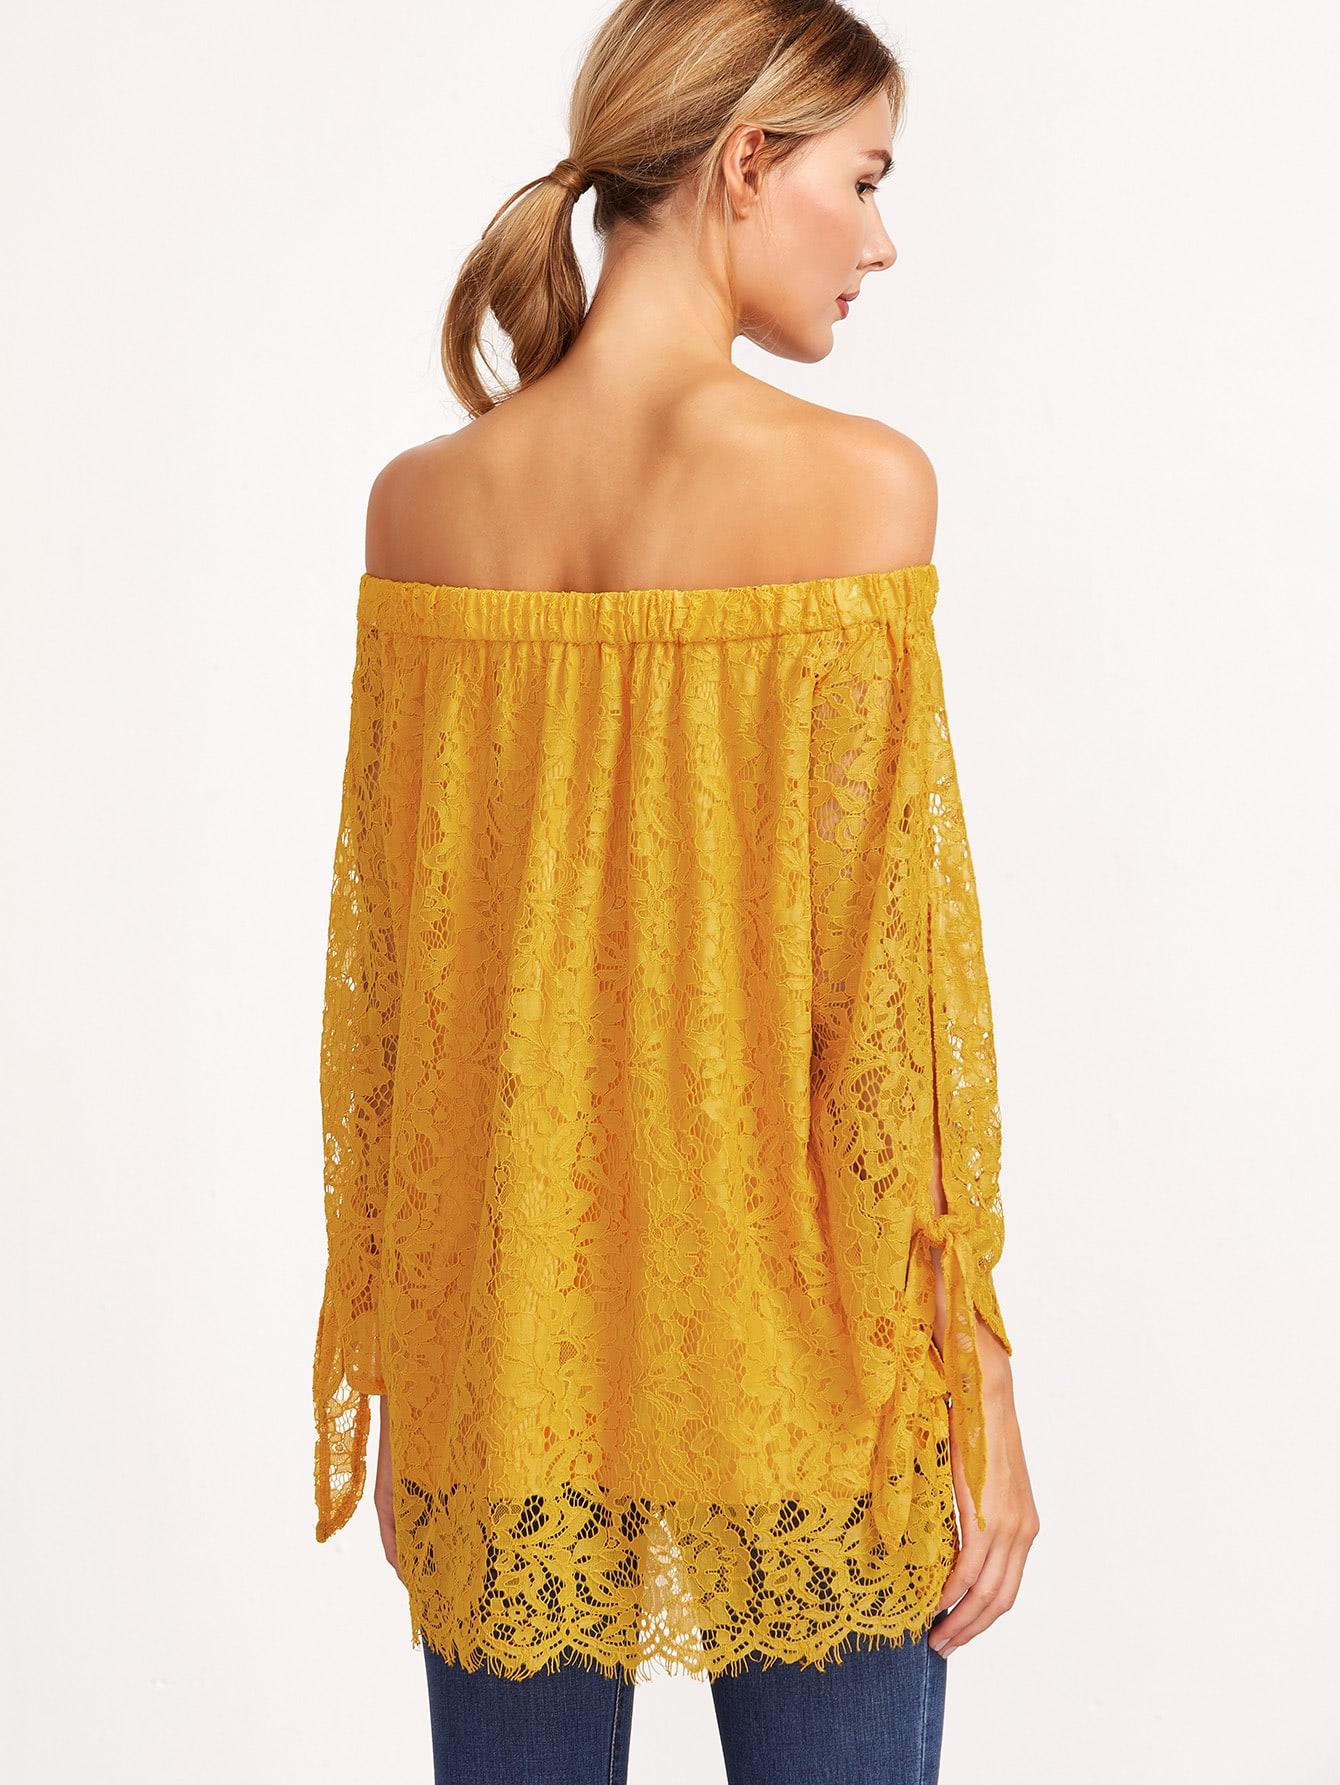 blouse161130718_2